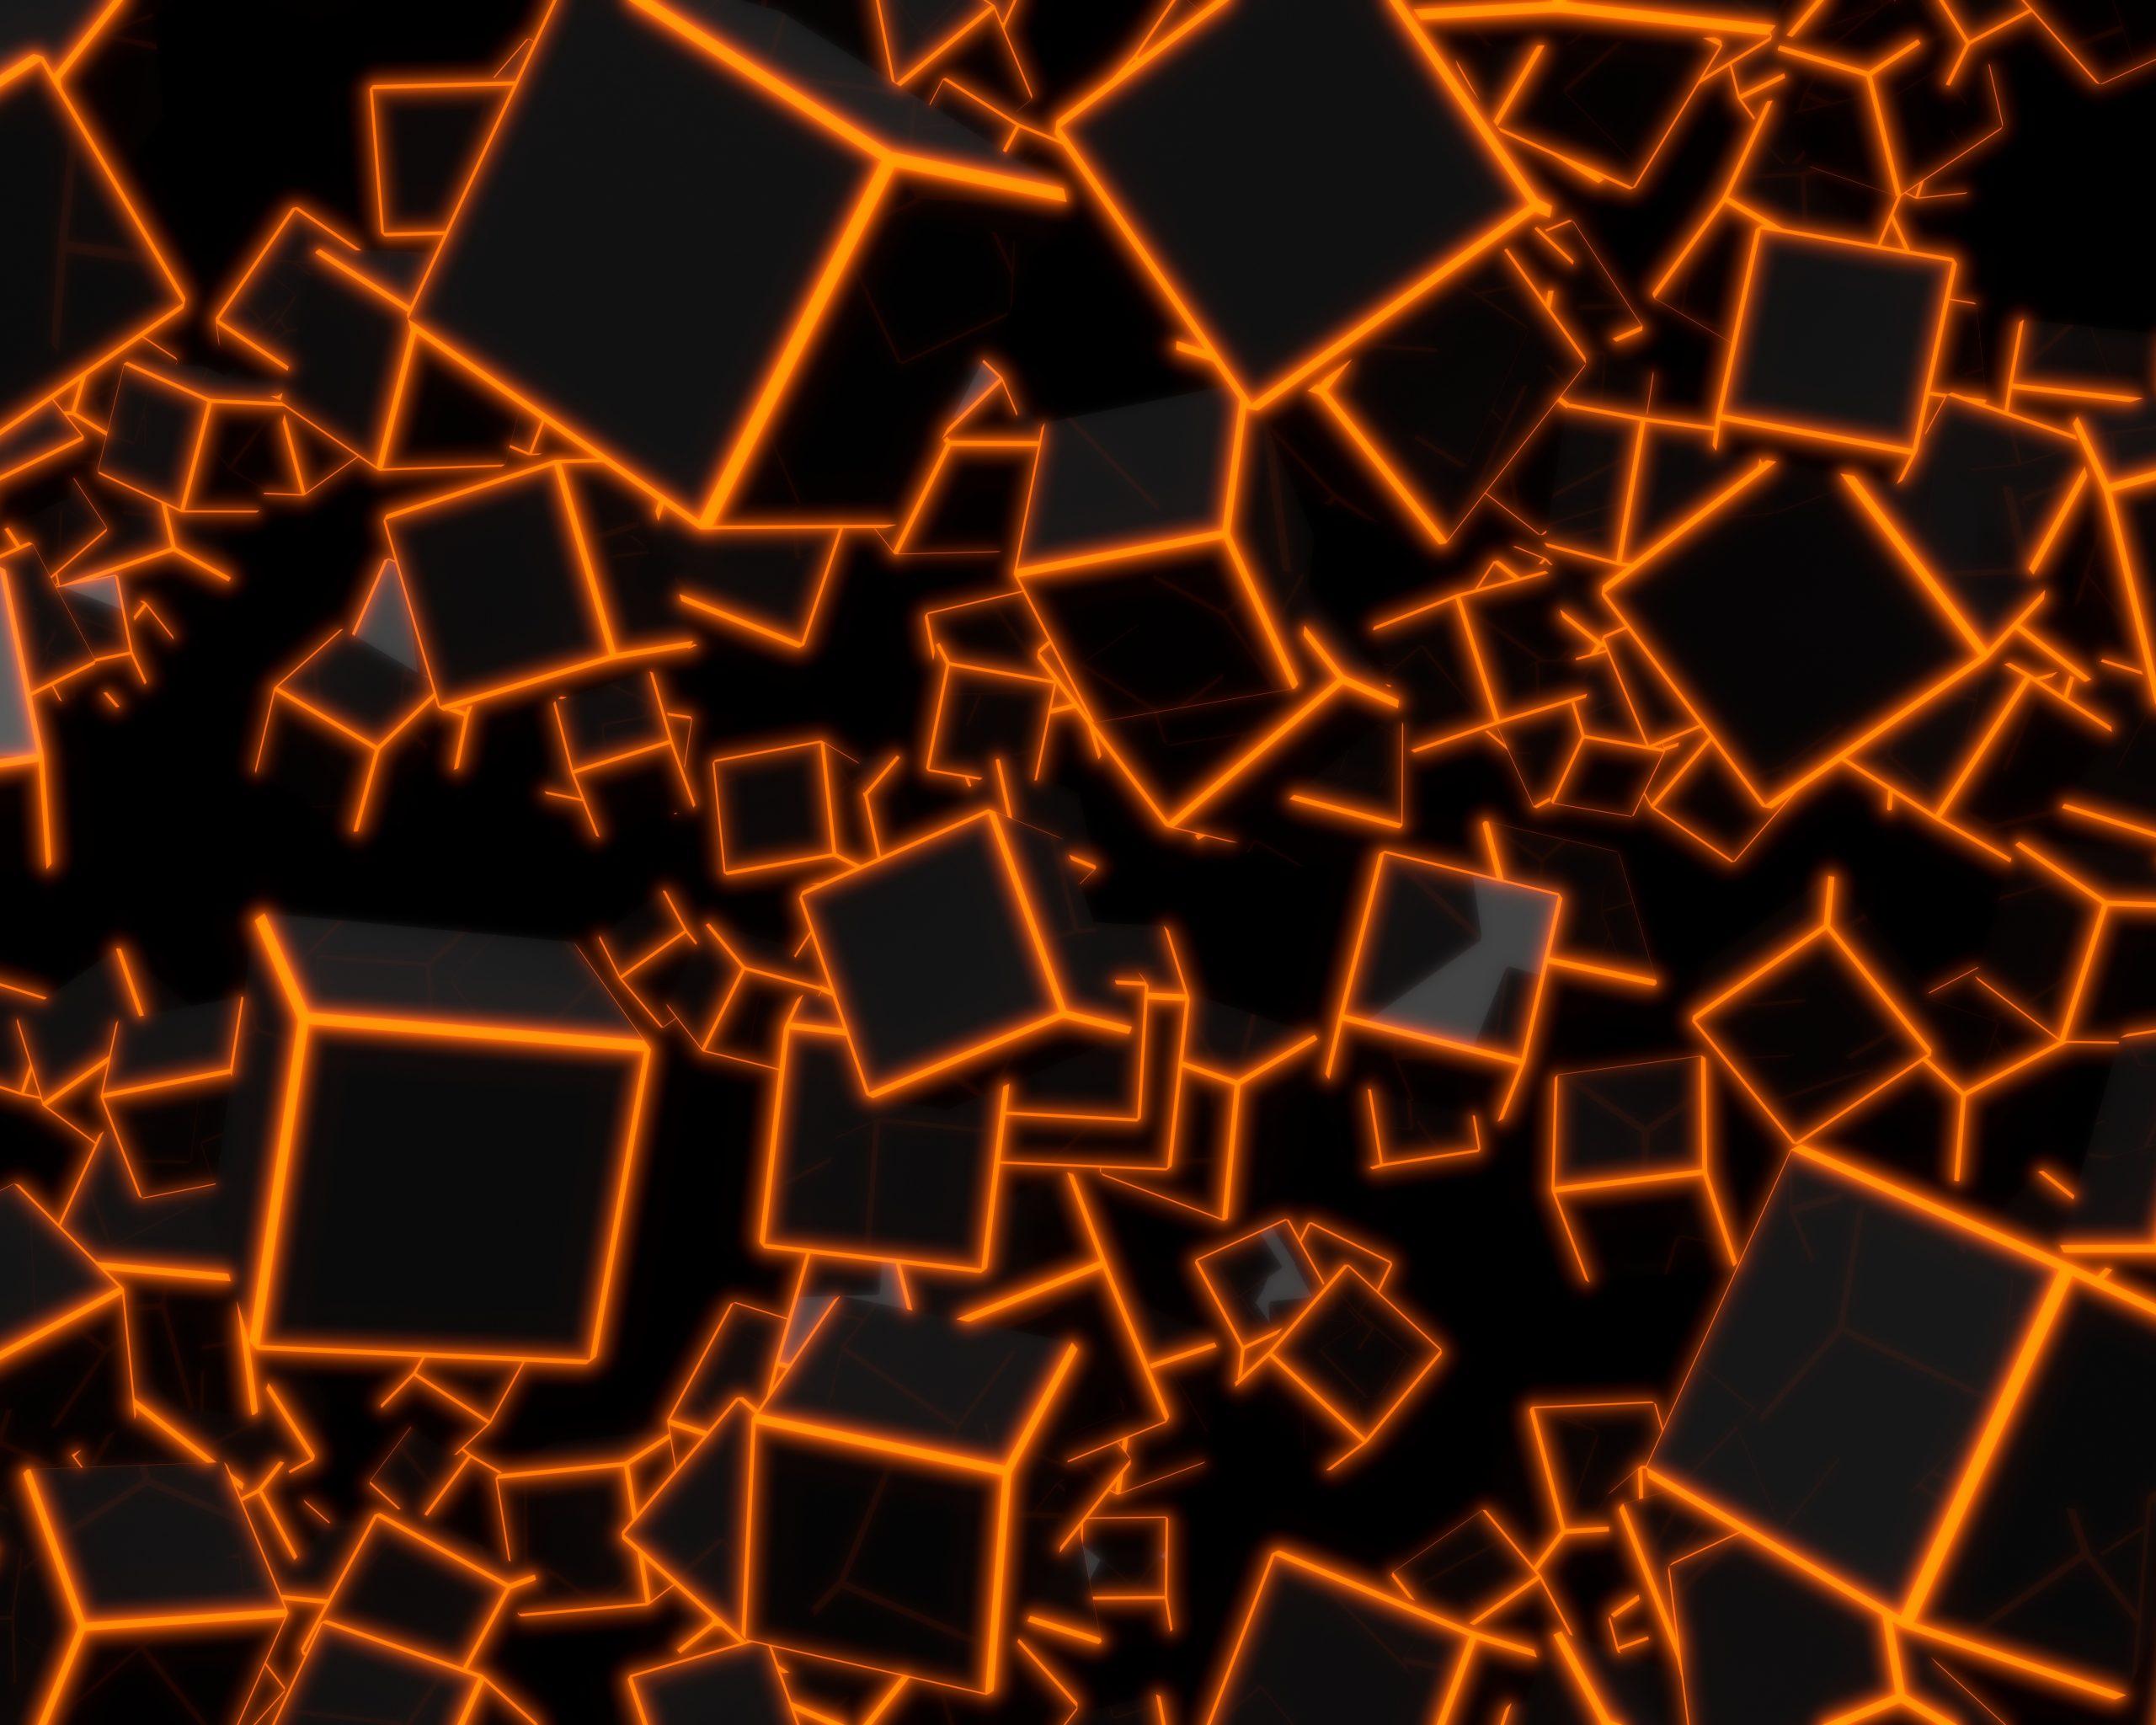 3D Orange Neon Cubes 8K UHD Wallpaper